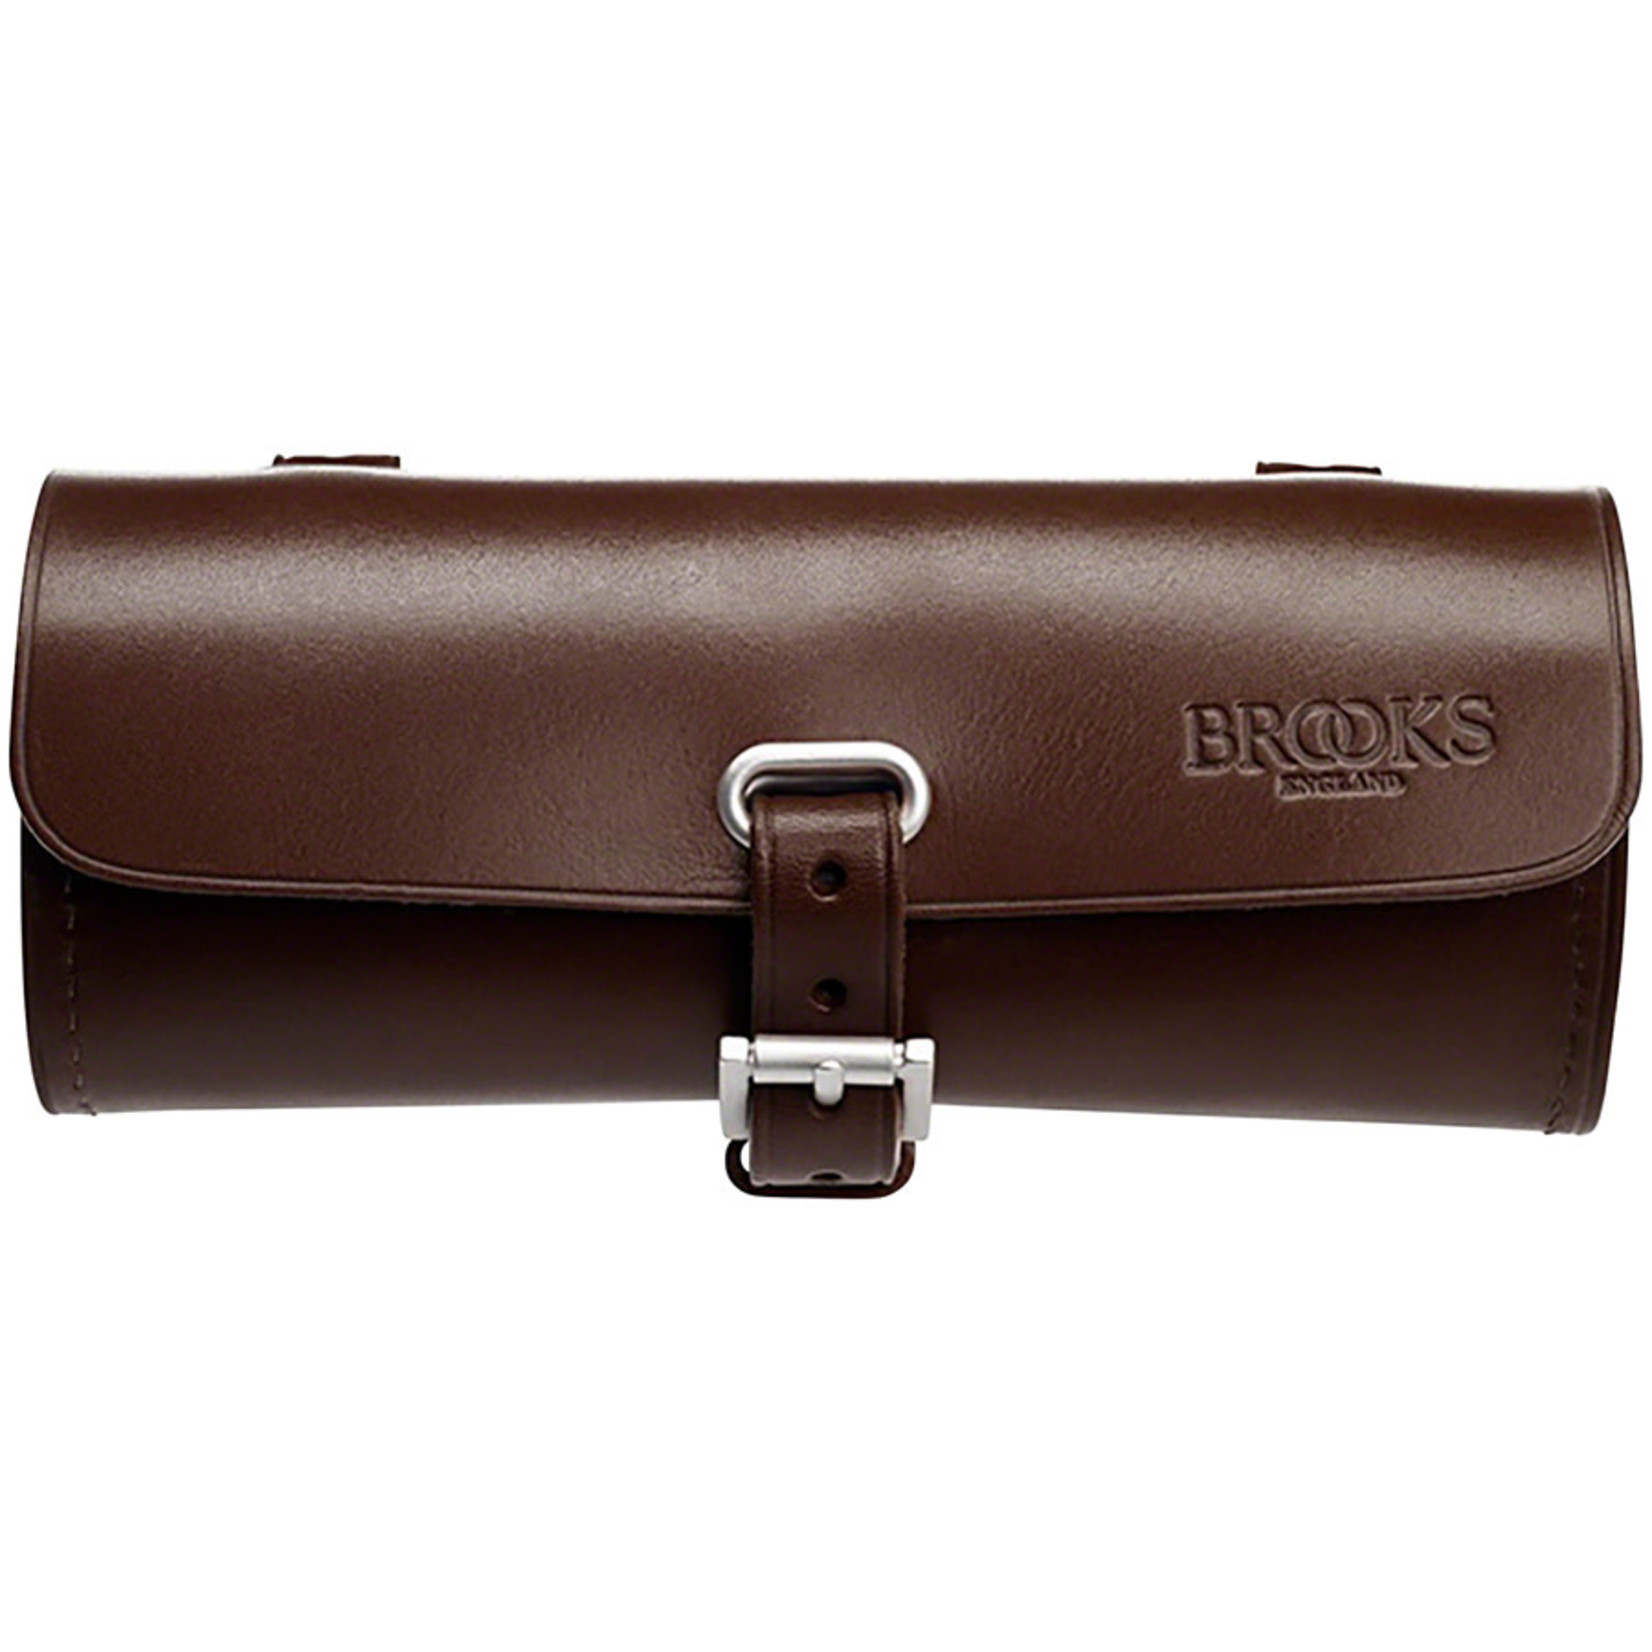 Brooks Brooks Challenge Tool Seat Bag: Antique Brown Leather